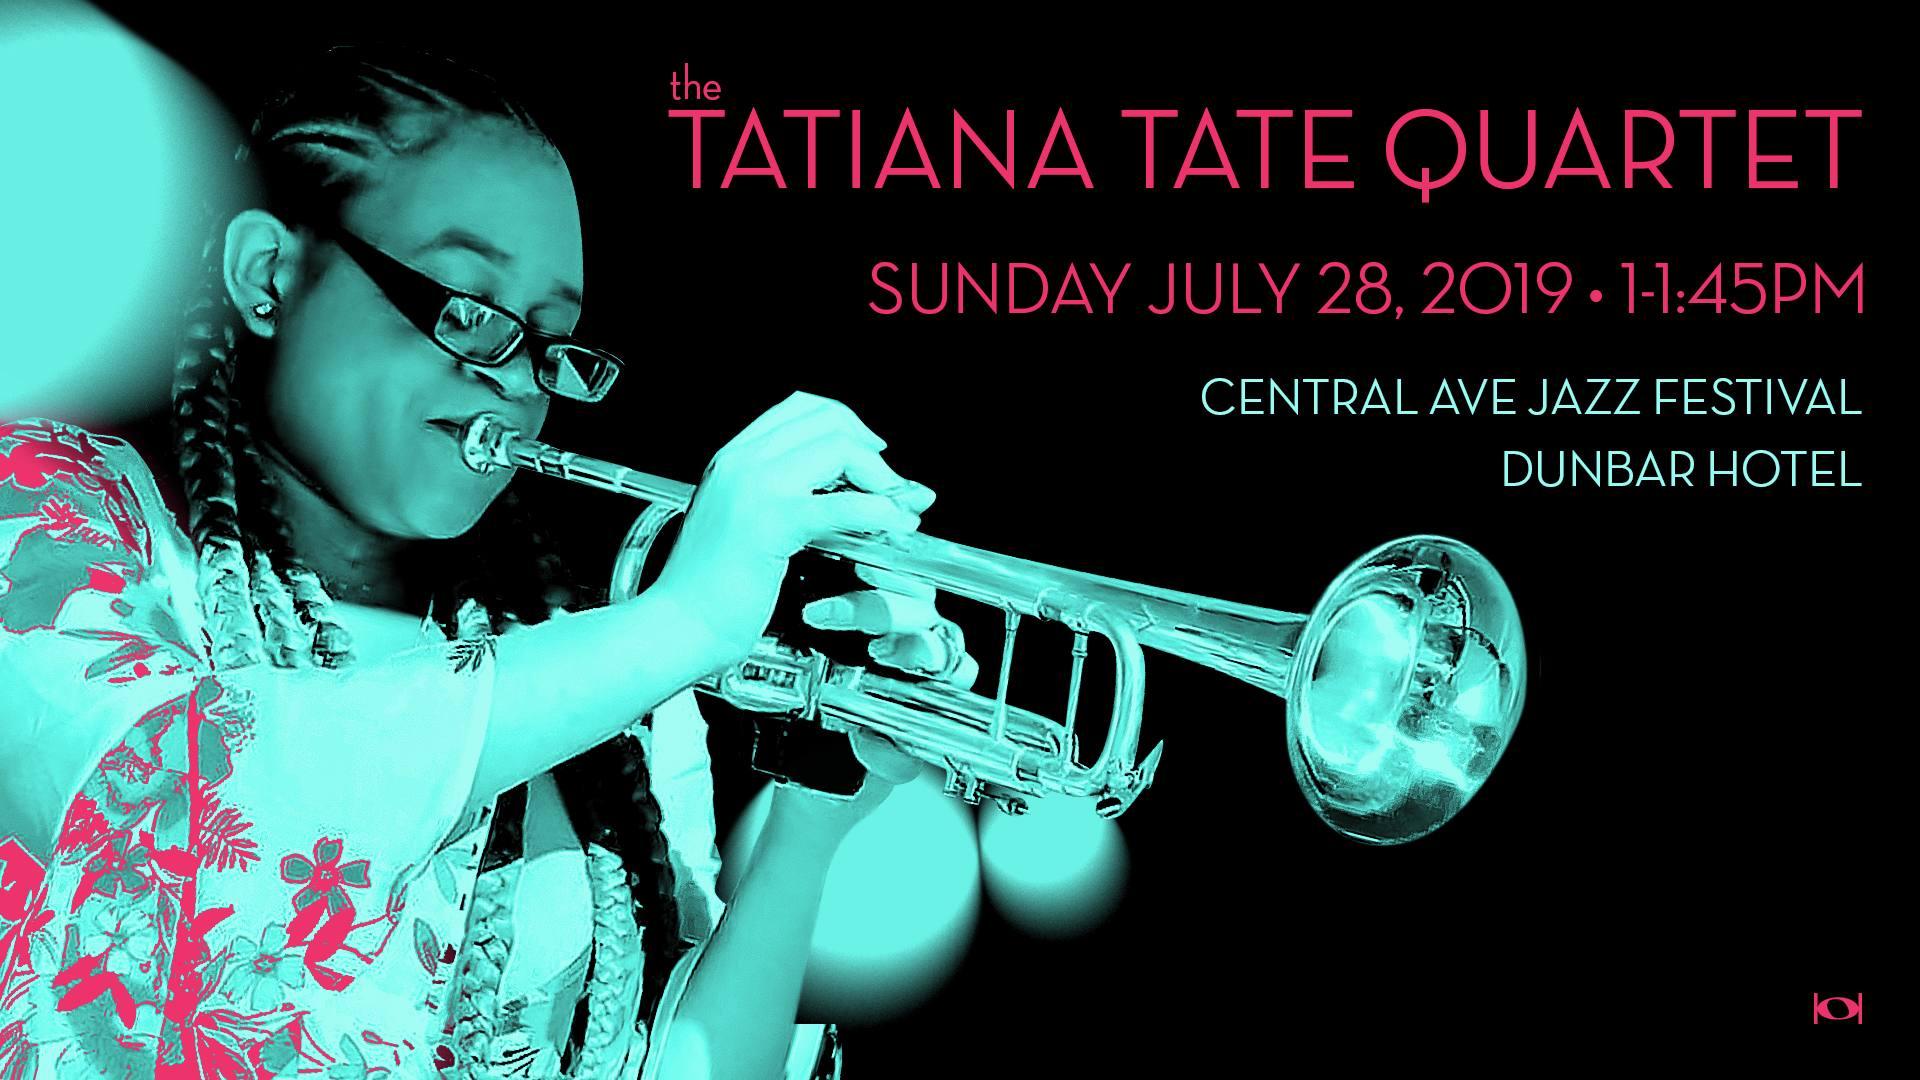 Tatiana Tate Quartet at the Dunbar Hotel July 2019